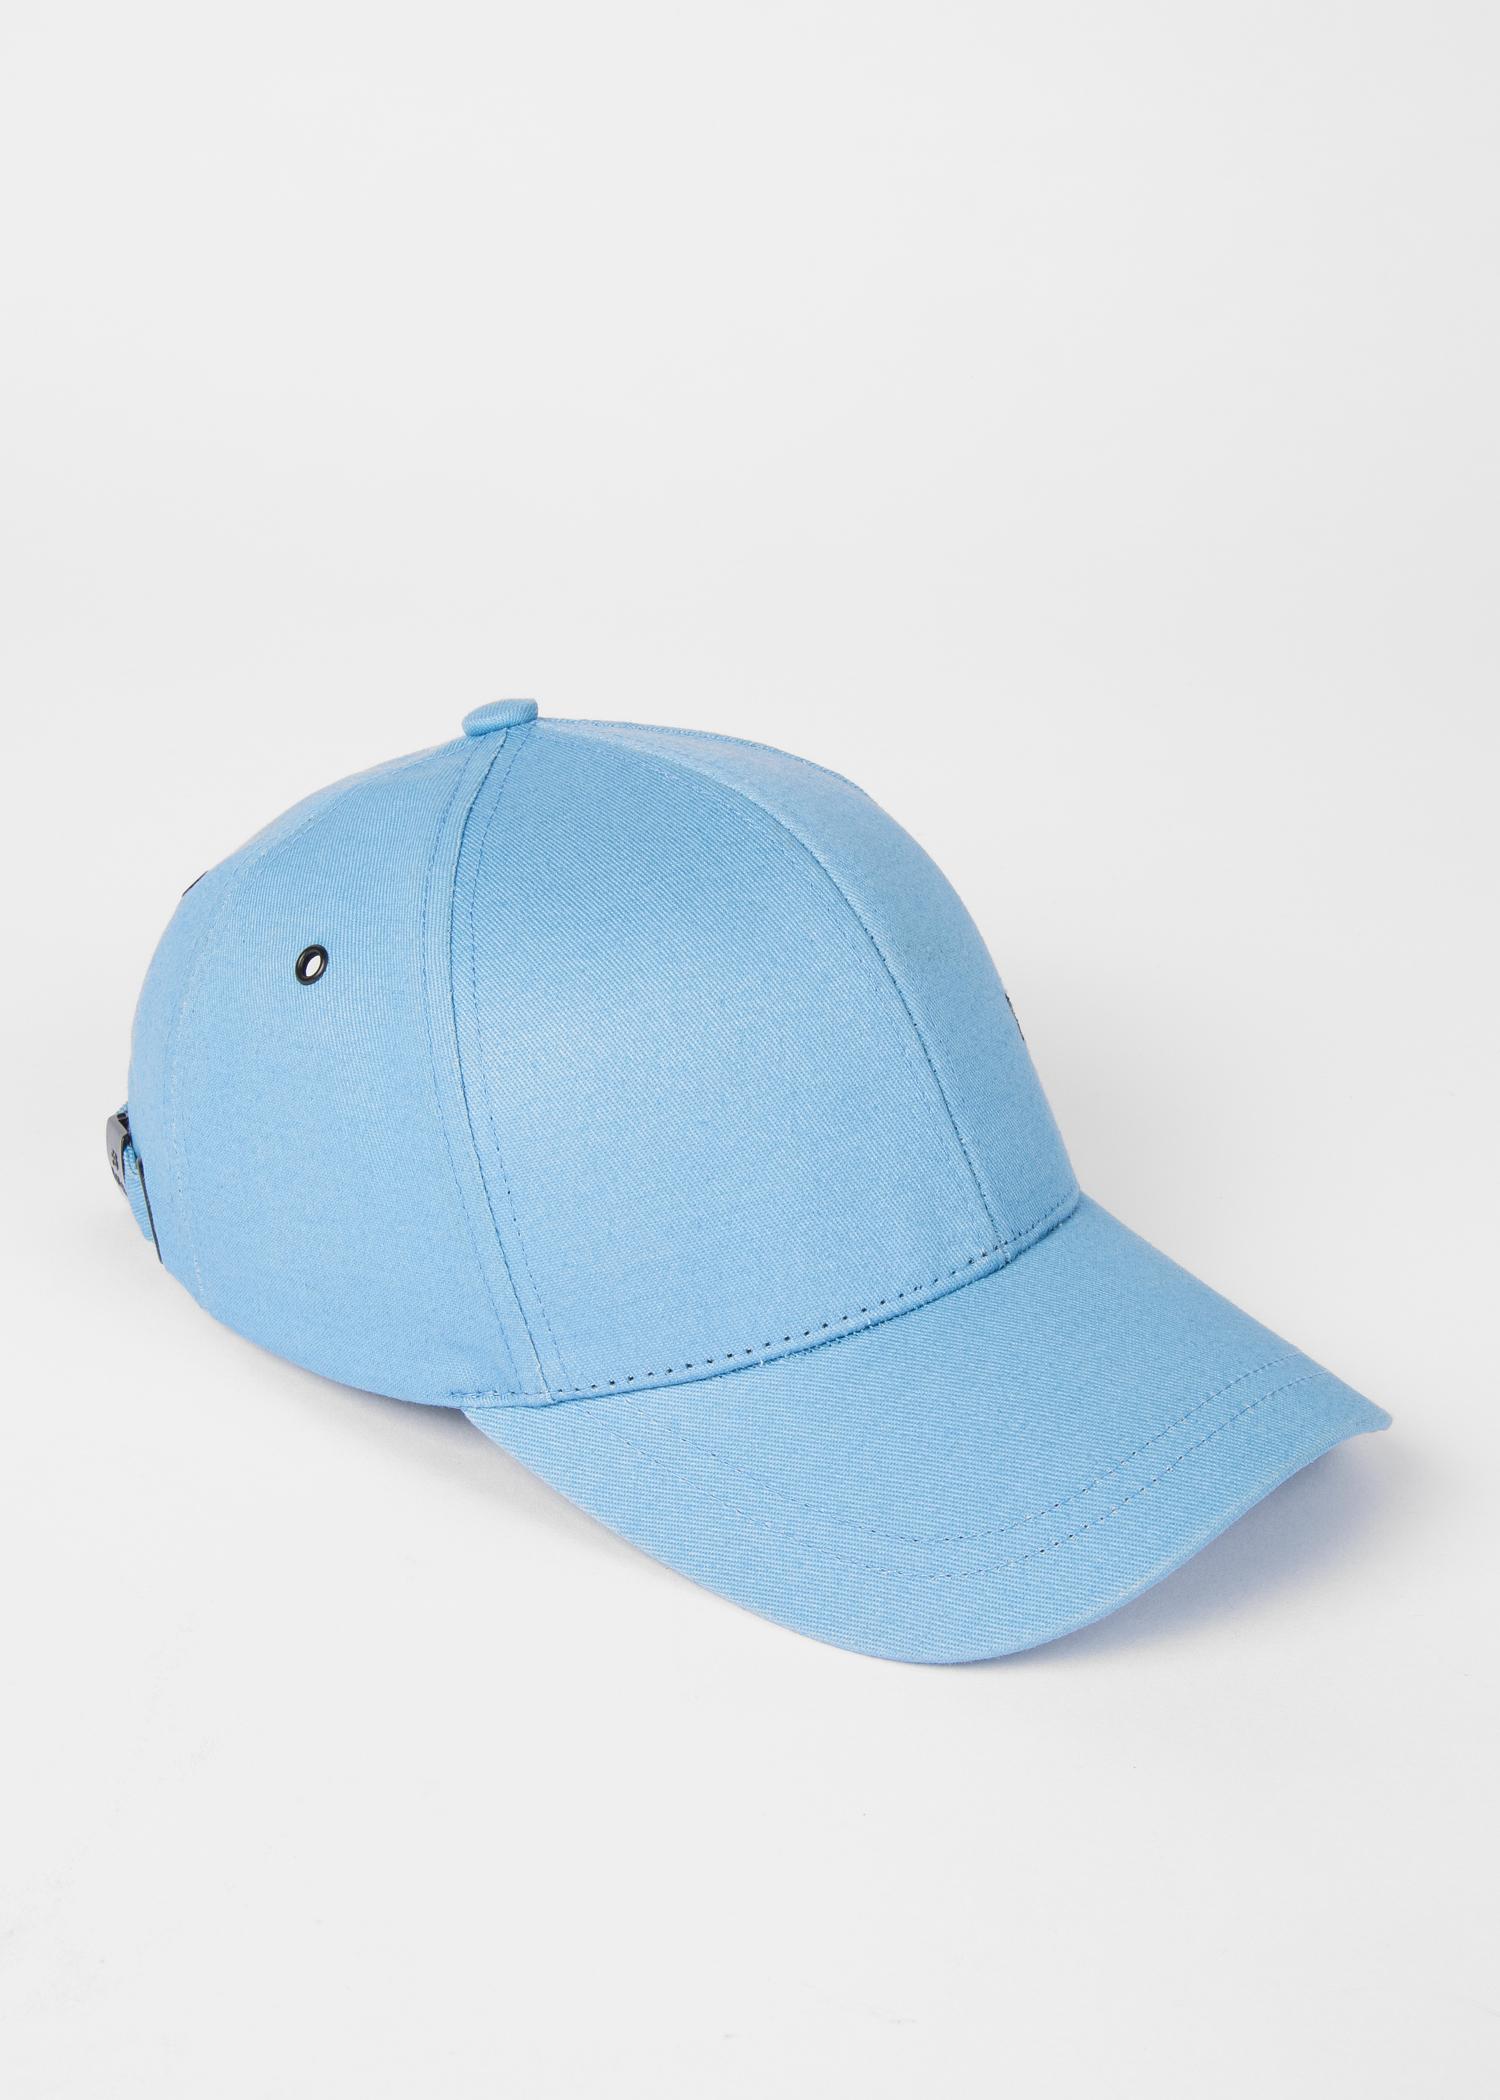 93760d62b75296 Angled View - Men's Sky Blue Cotton Zebra Logo Baseball Cap Paul Smith